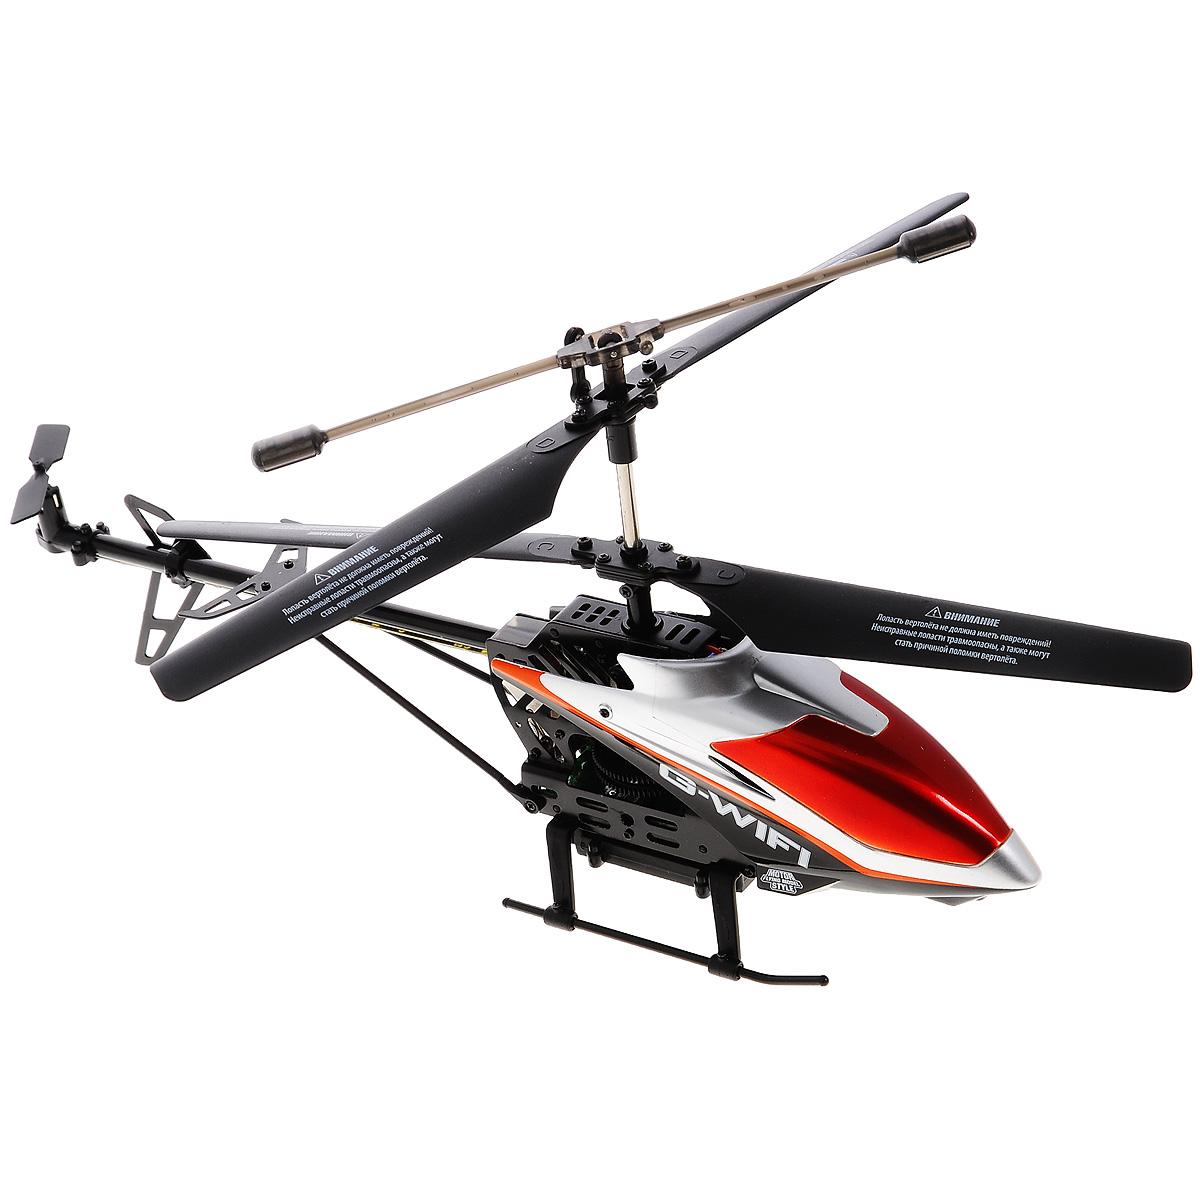 1TOY Вертолет на радиоуправлении Gyro Wi-Fi